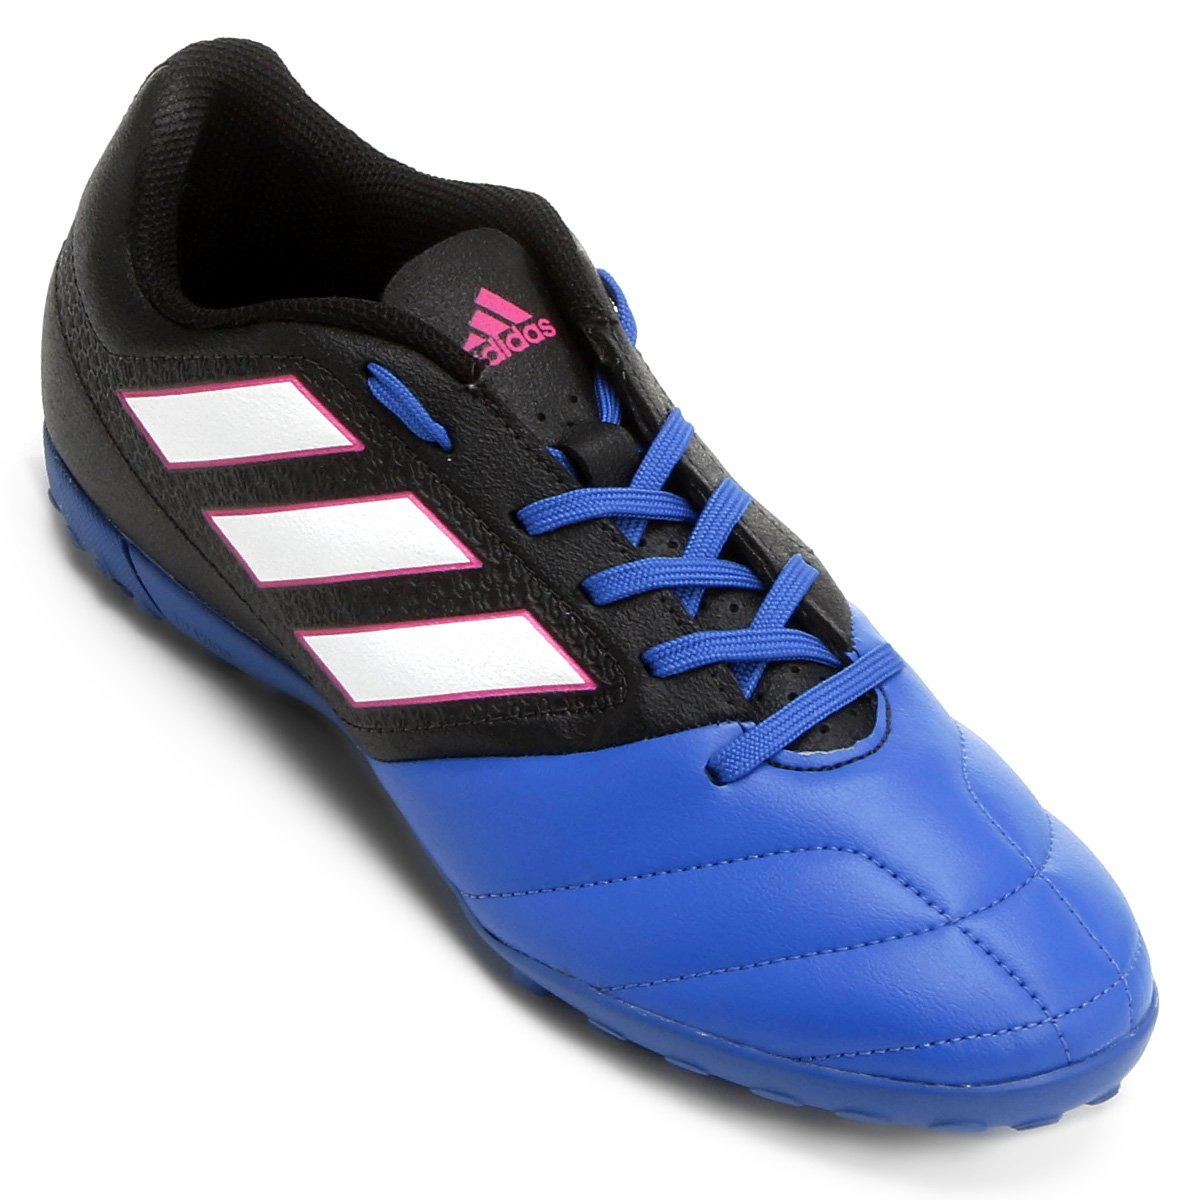 TF Adidas Preto 17 Chuteira Society 4 Azul e Ace Masculina SZFq4ZwyXR